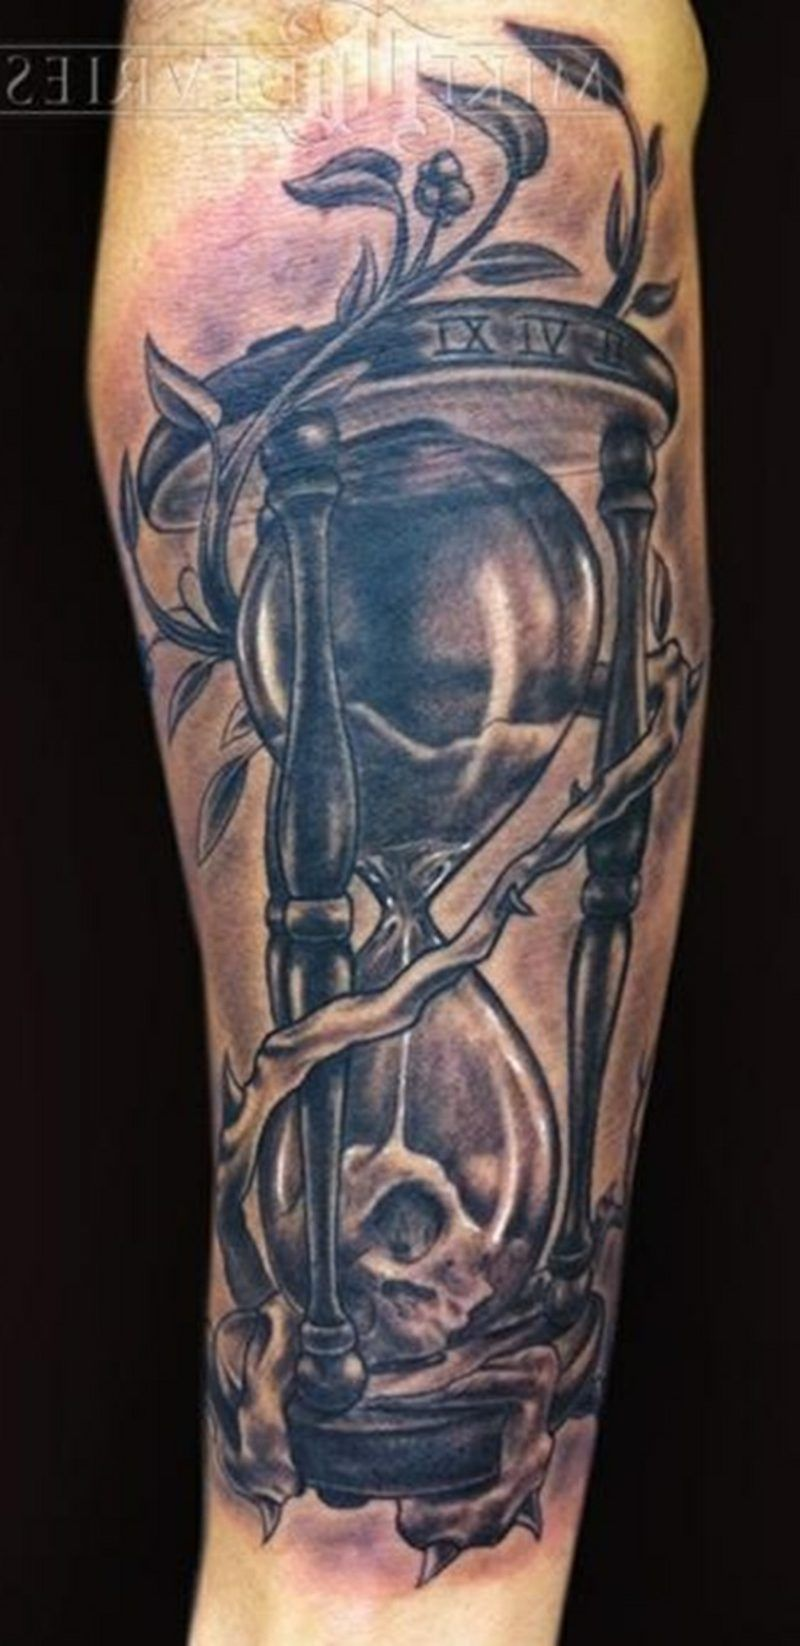 hourglass tattoo simbolismo y origen tatuajes tatouage tatouage sablier ve tatouage amoureux. Black Bedroom Furniture Sets. Home Design Ideas